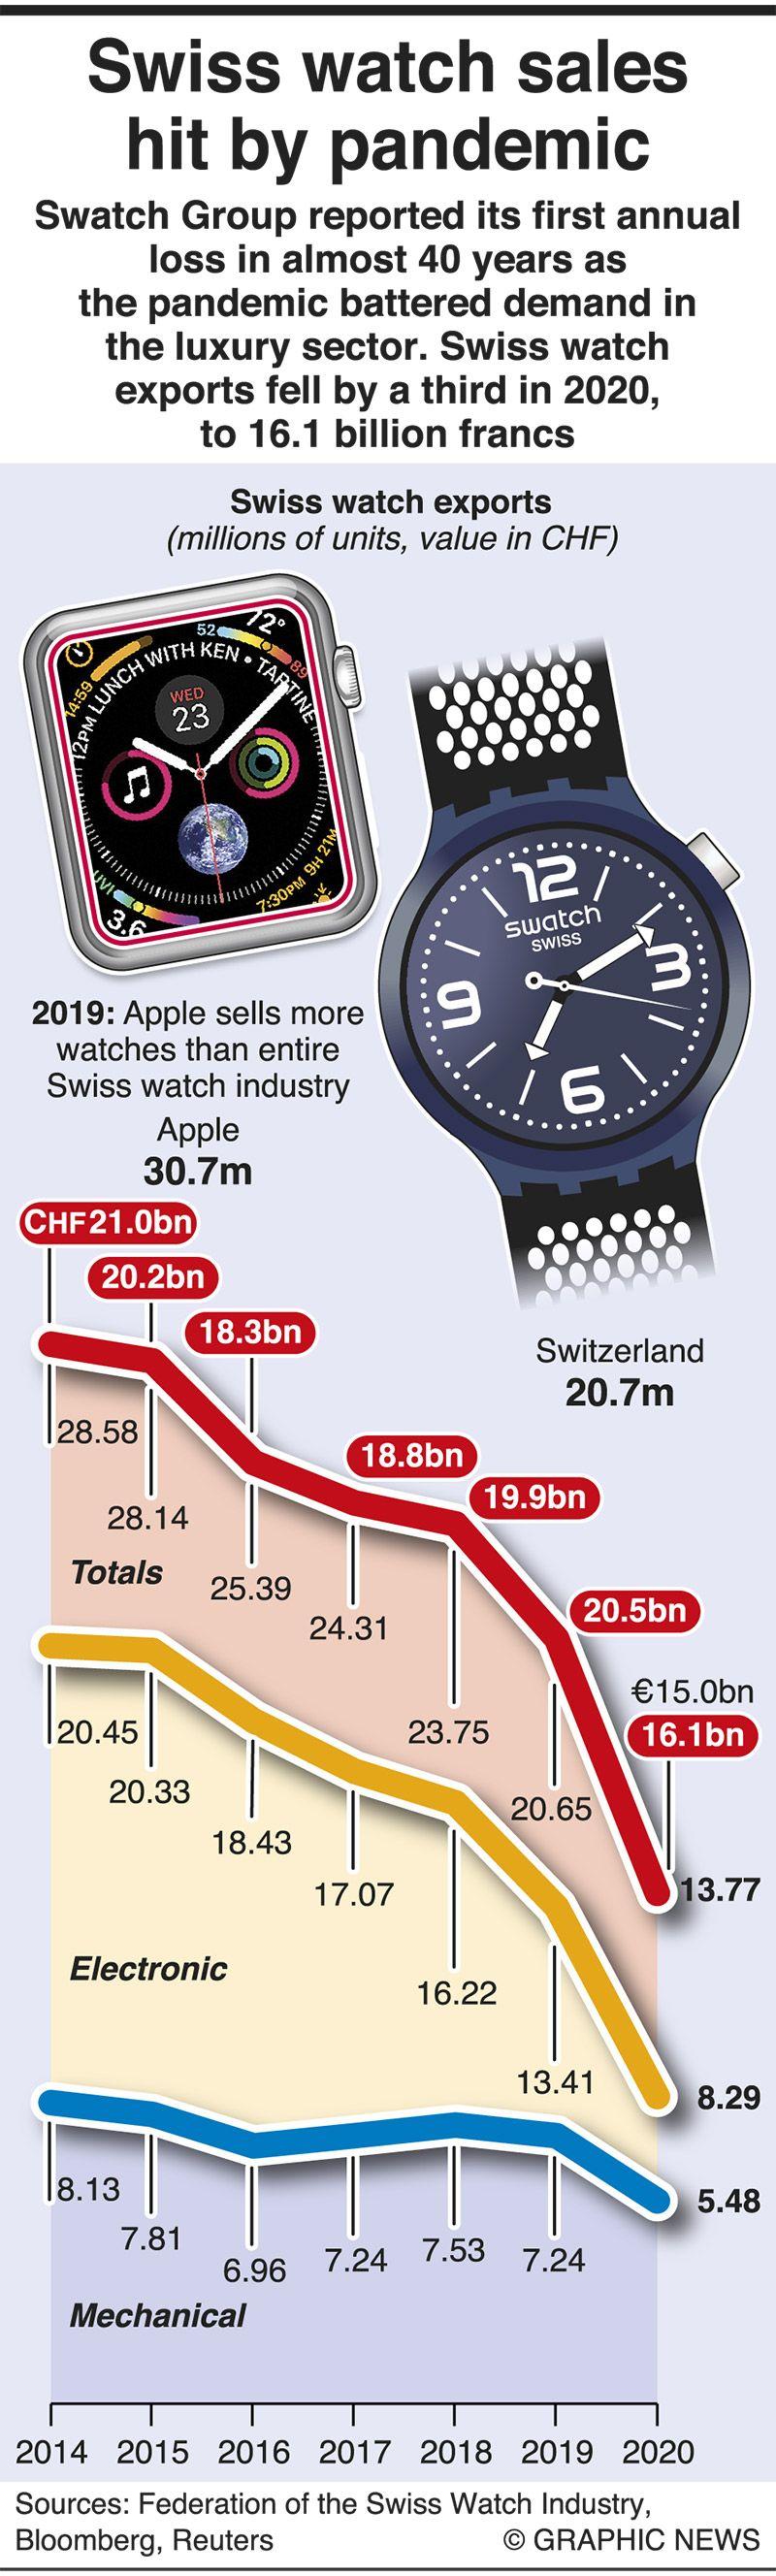 Swiss watch sales hit by COVID-19